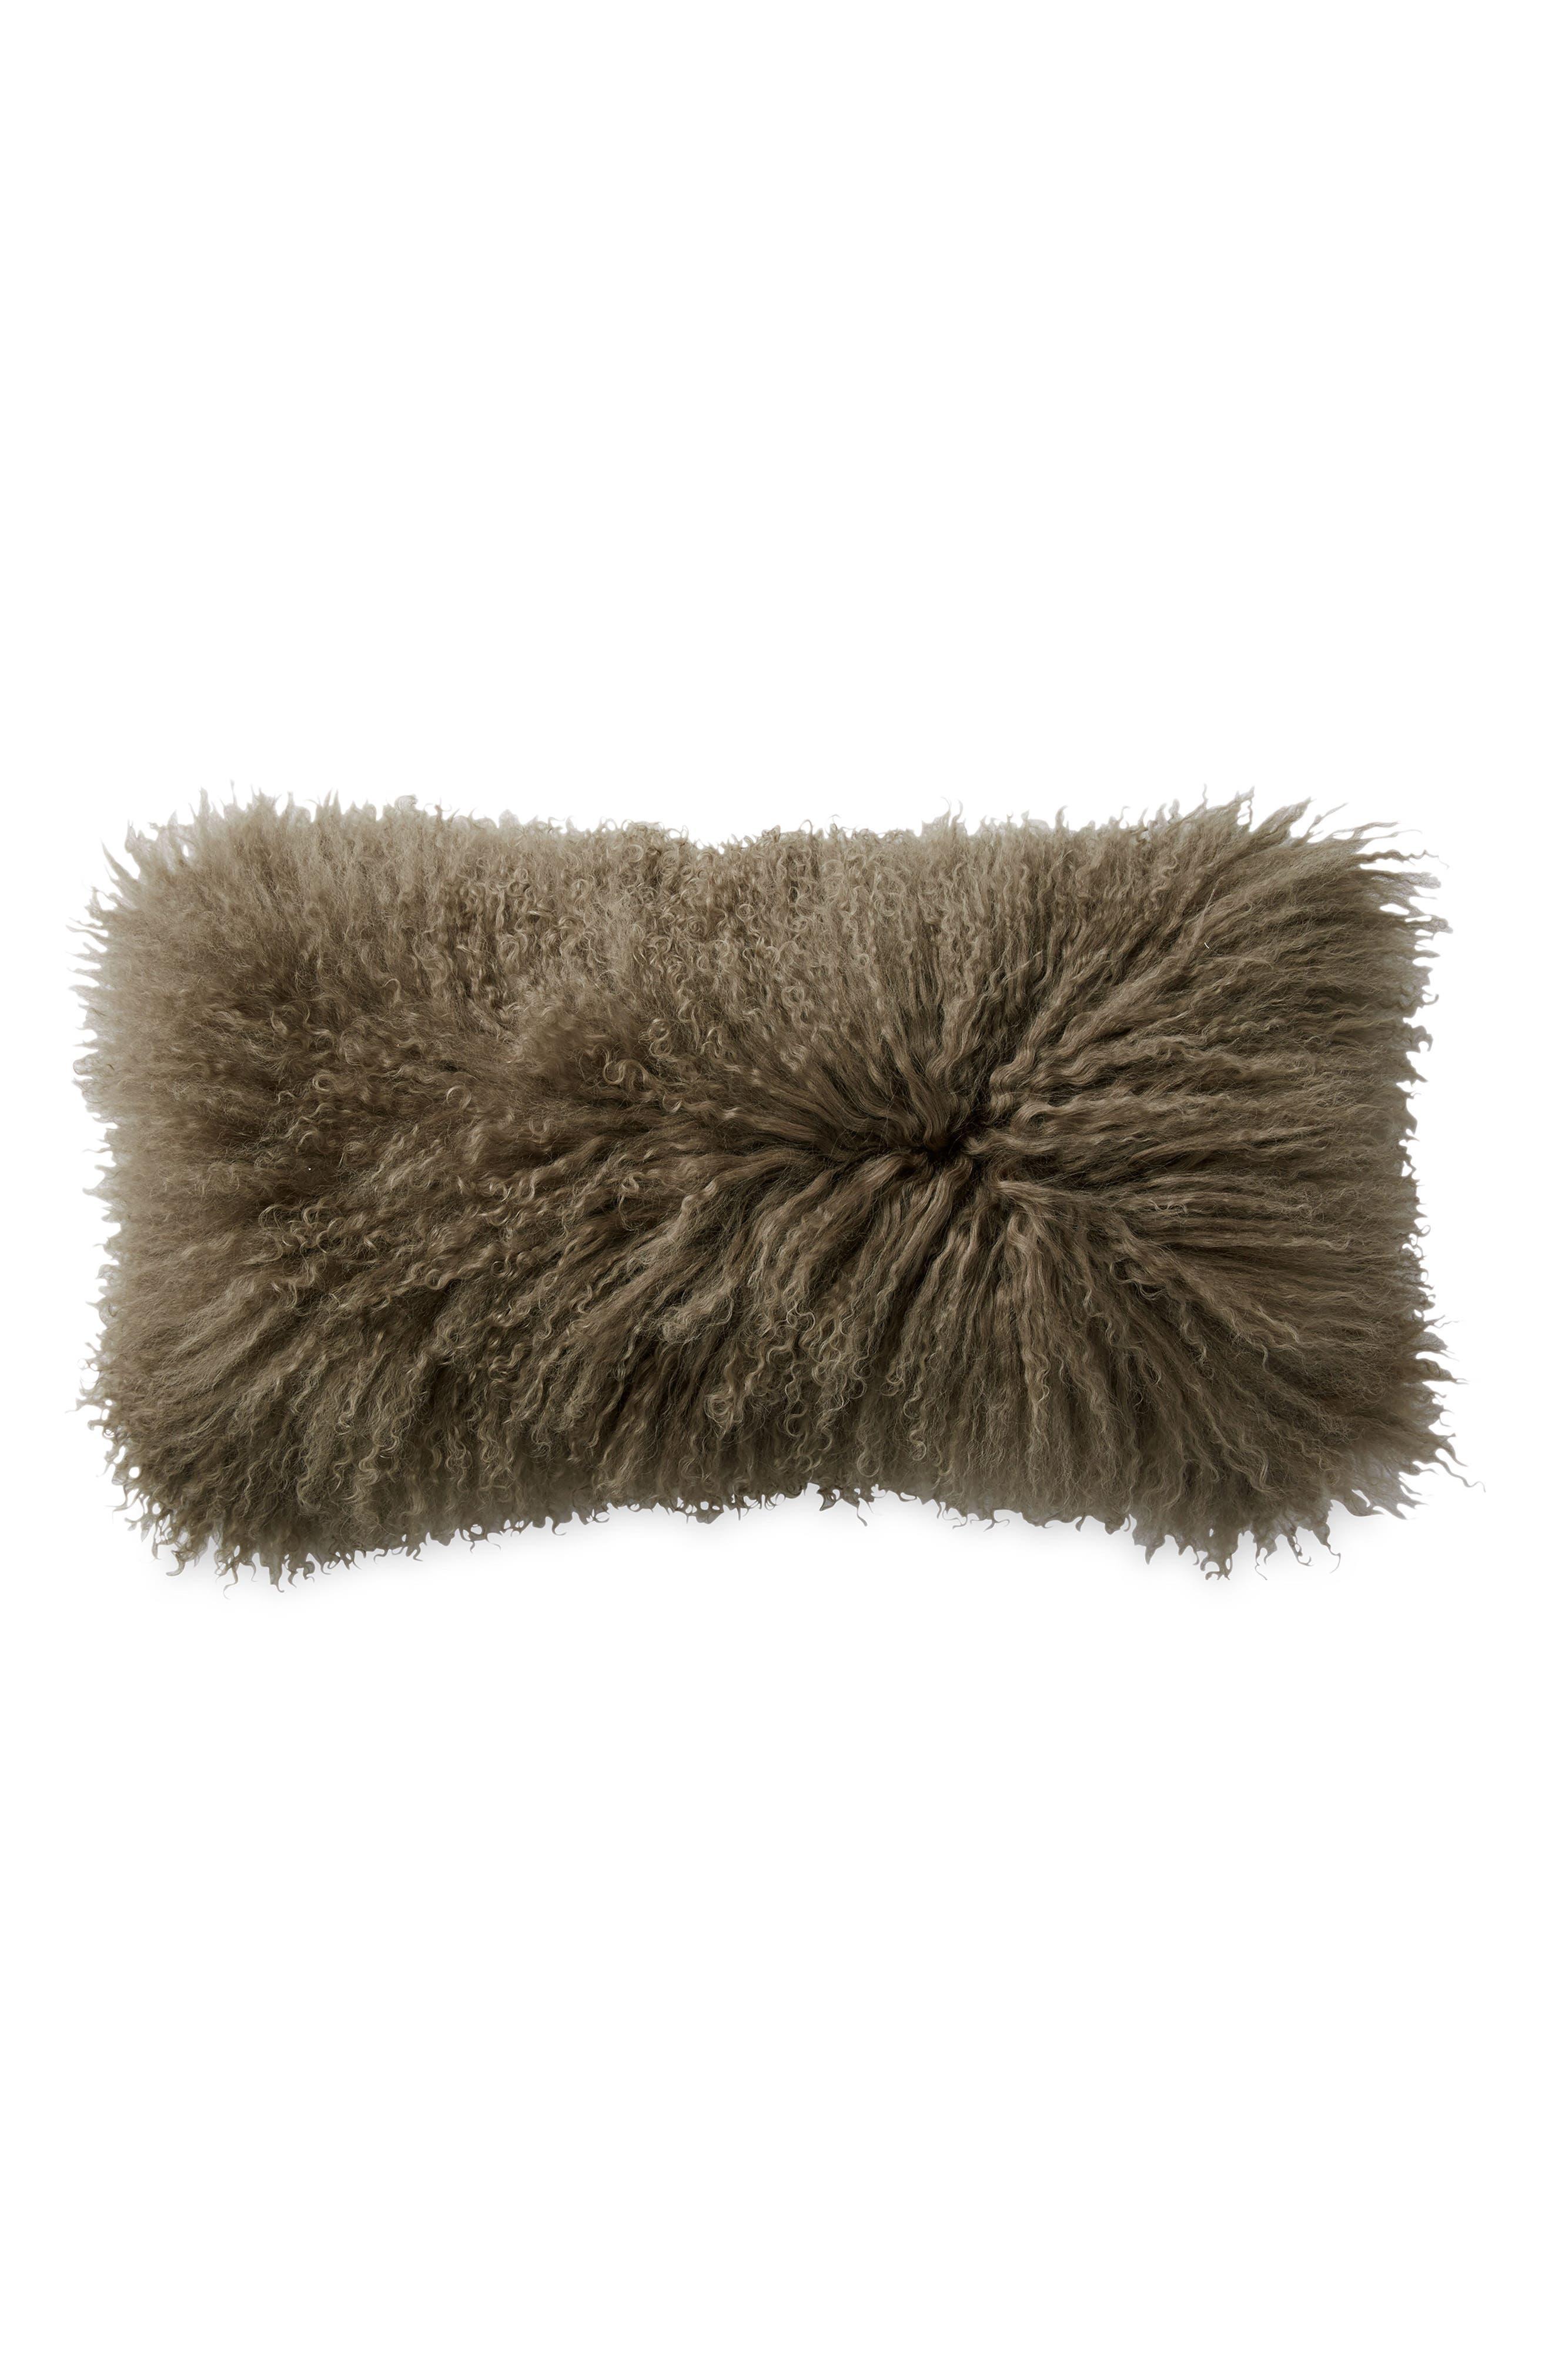 Donna Karan Flokati Genuine Shearling Accent Pillow